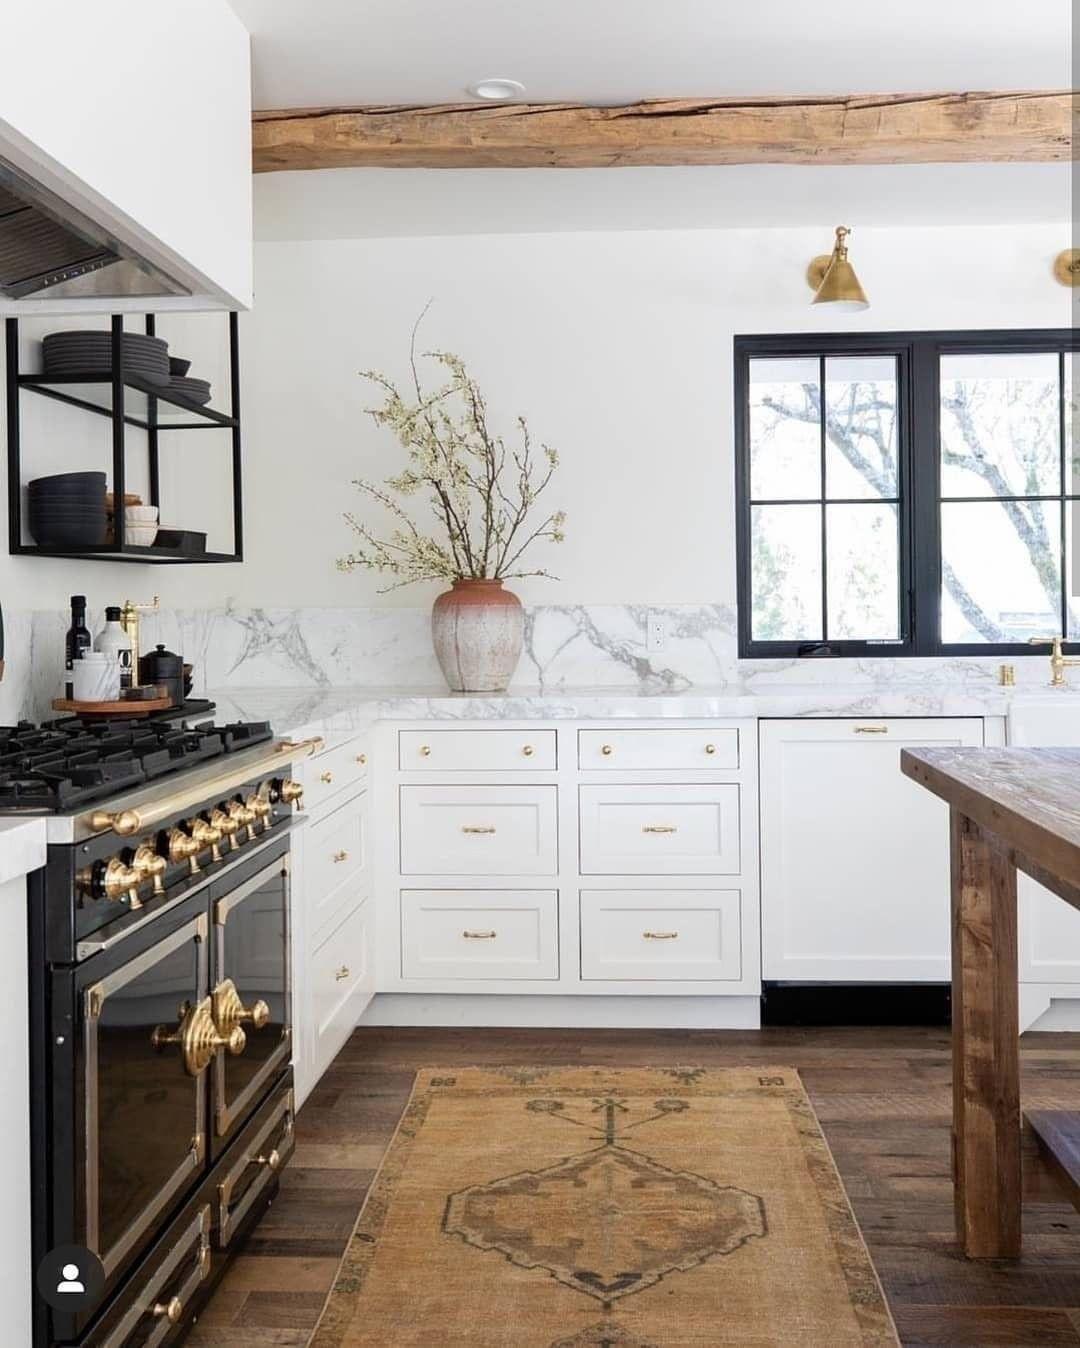 Shannon Jodi On Instagram Design My Kitchen No Questions